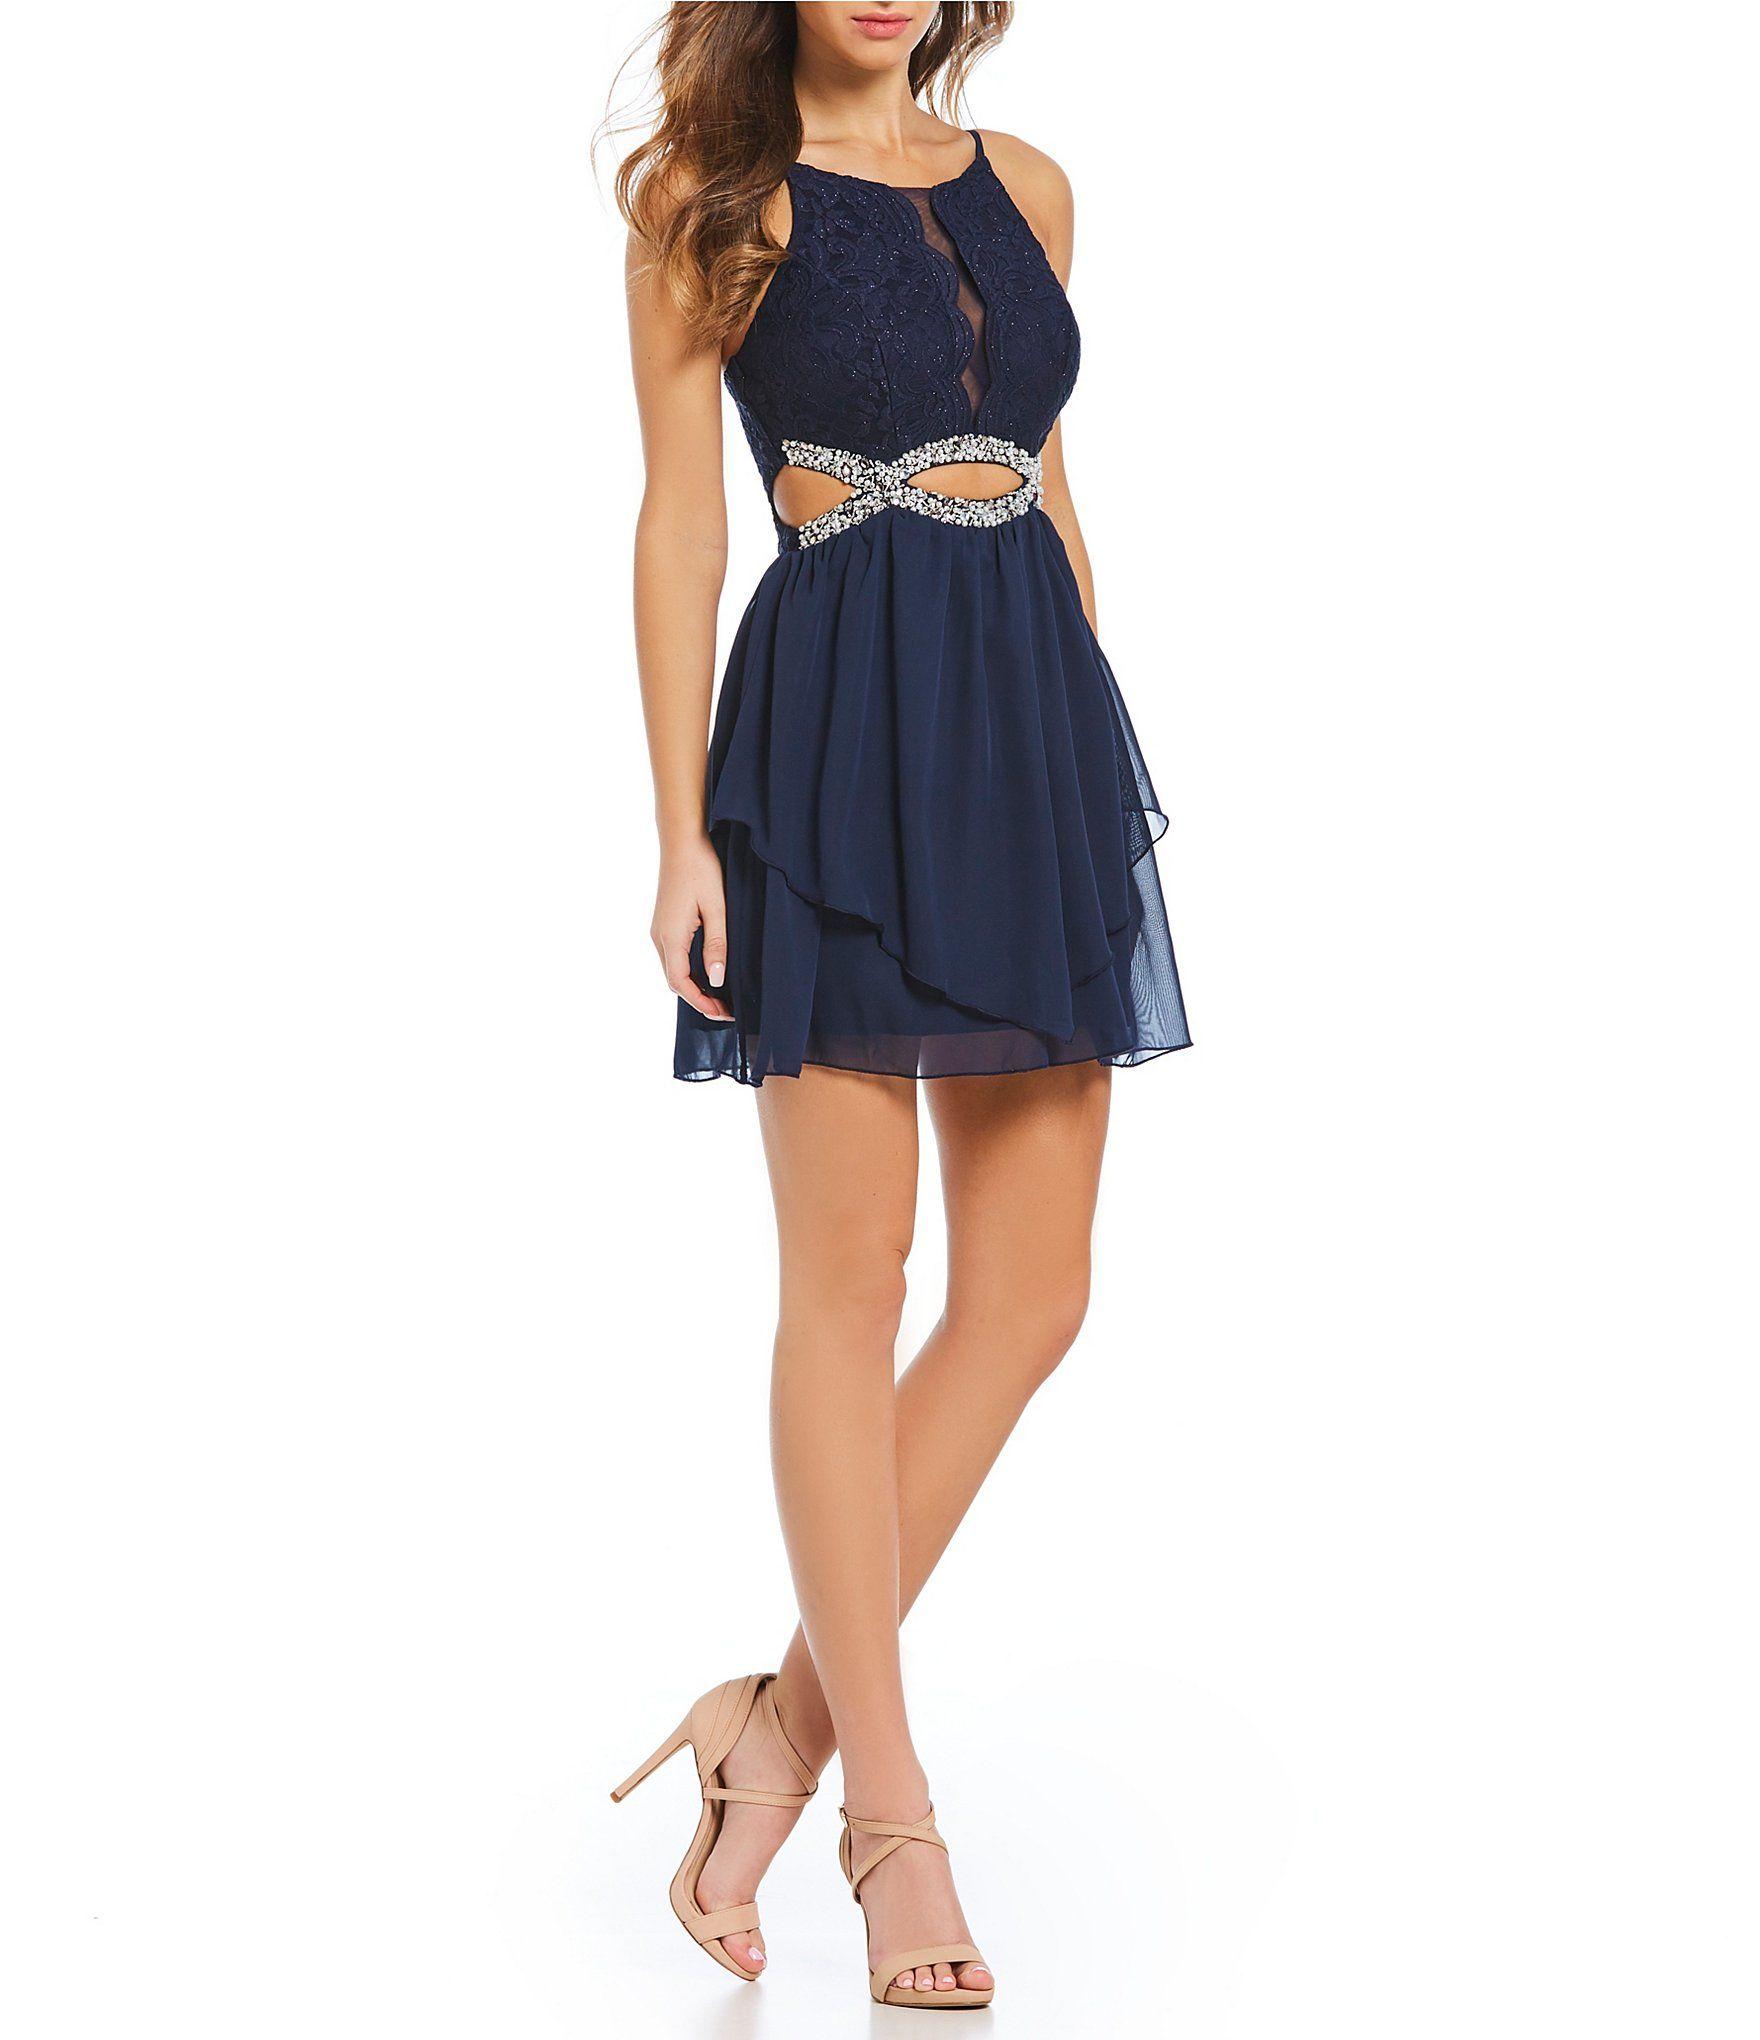 354d8784b8c Shop for Xtraordinary Spaghetti Straps Beaded Infinity Waist Dress at  Dillards.com. Visit Dillards.com to find clothing